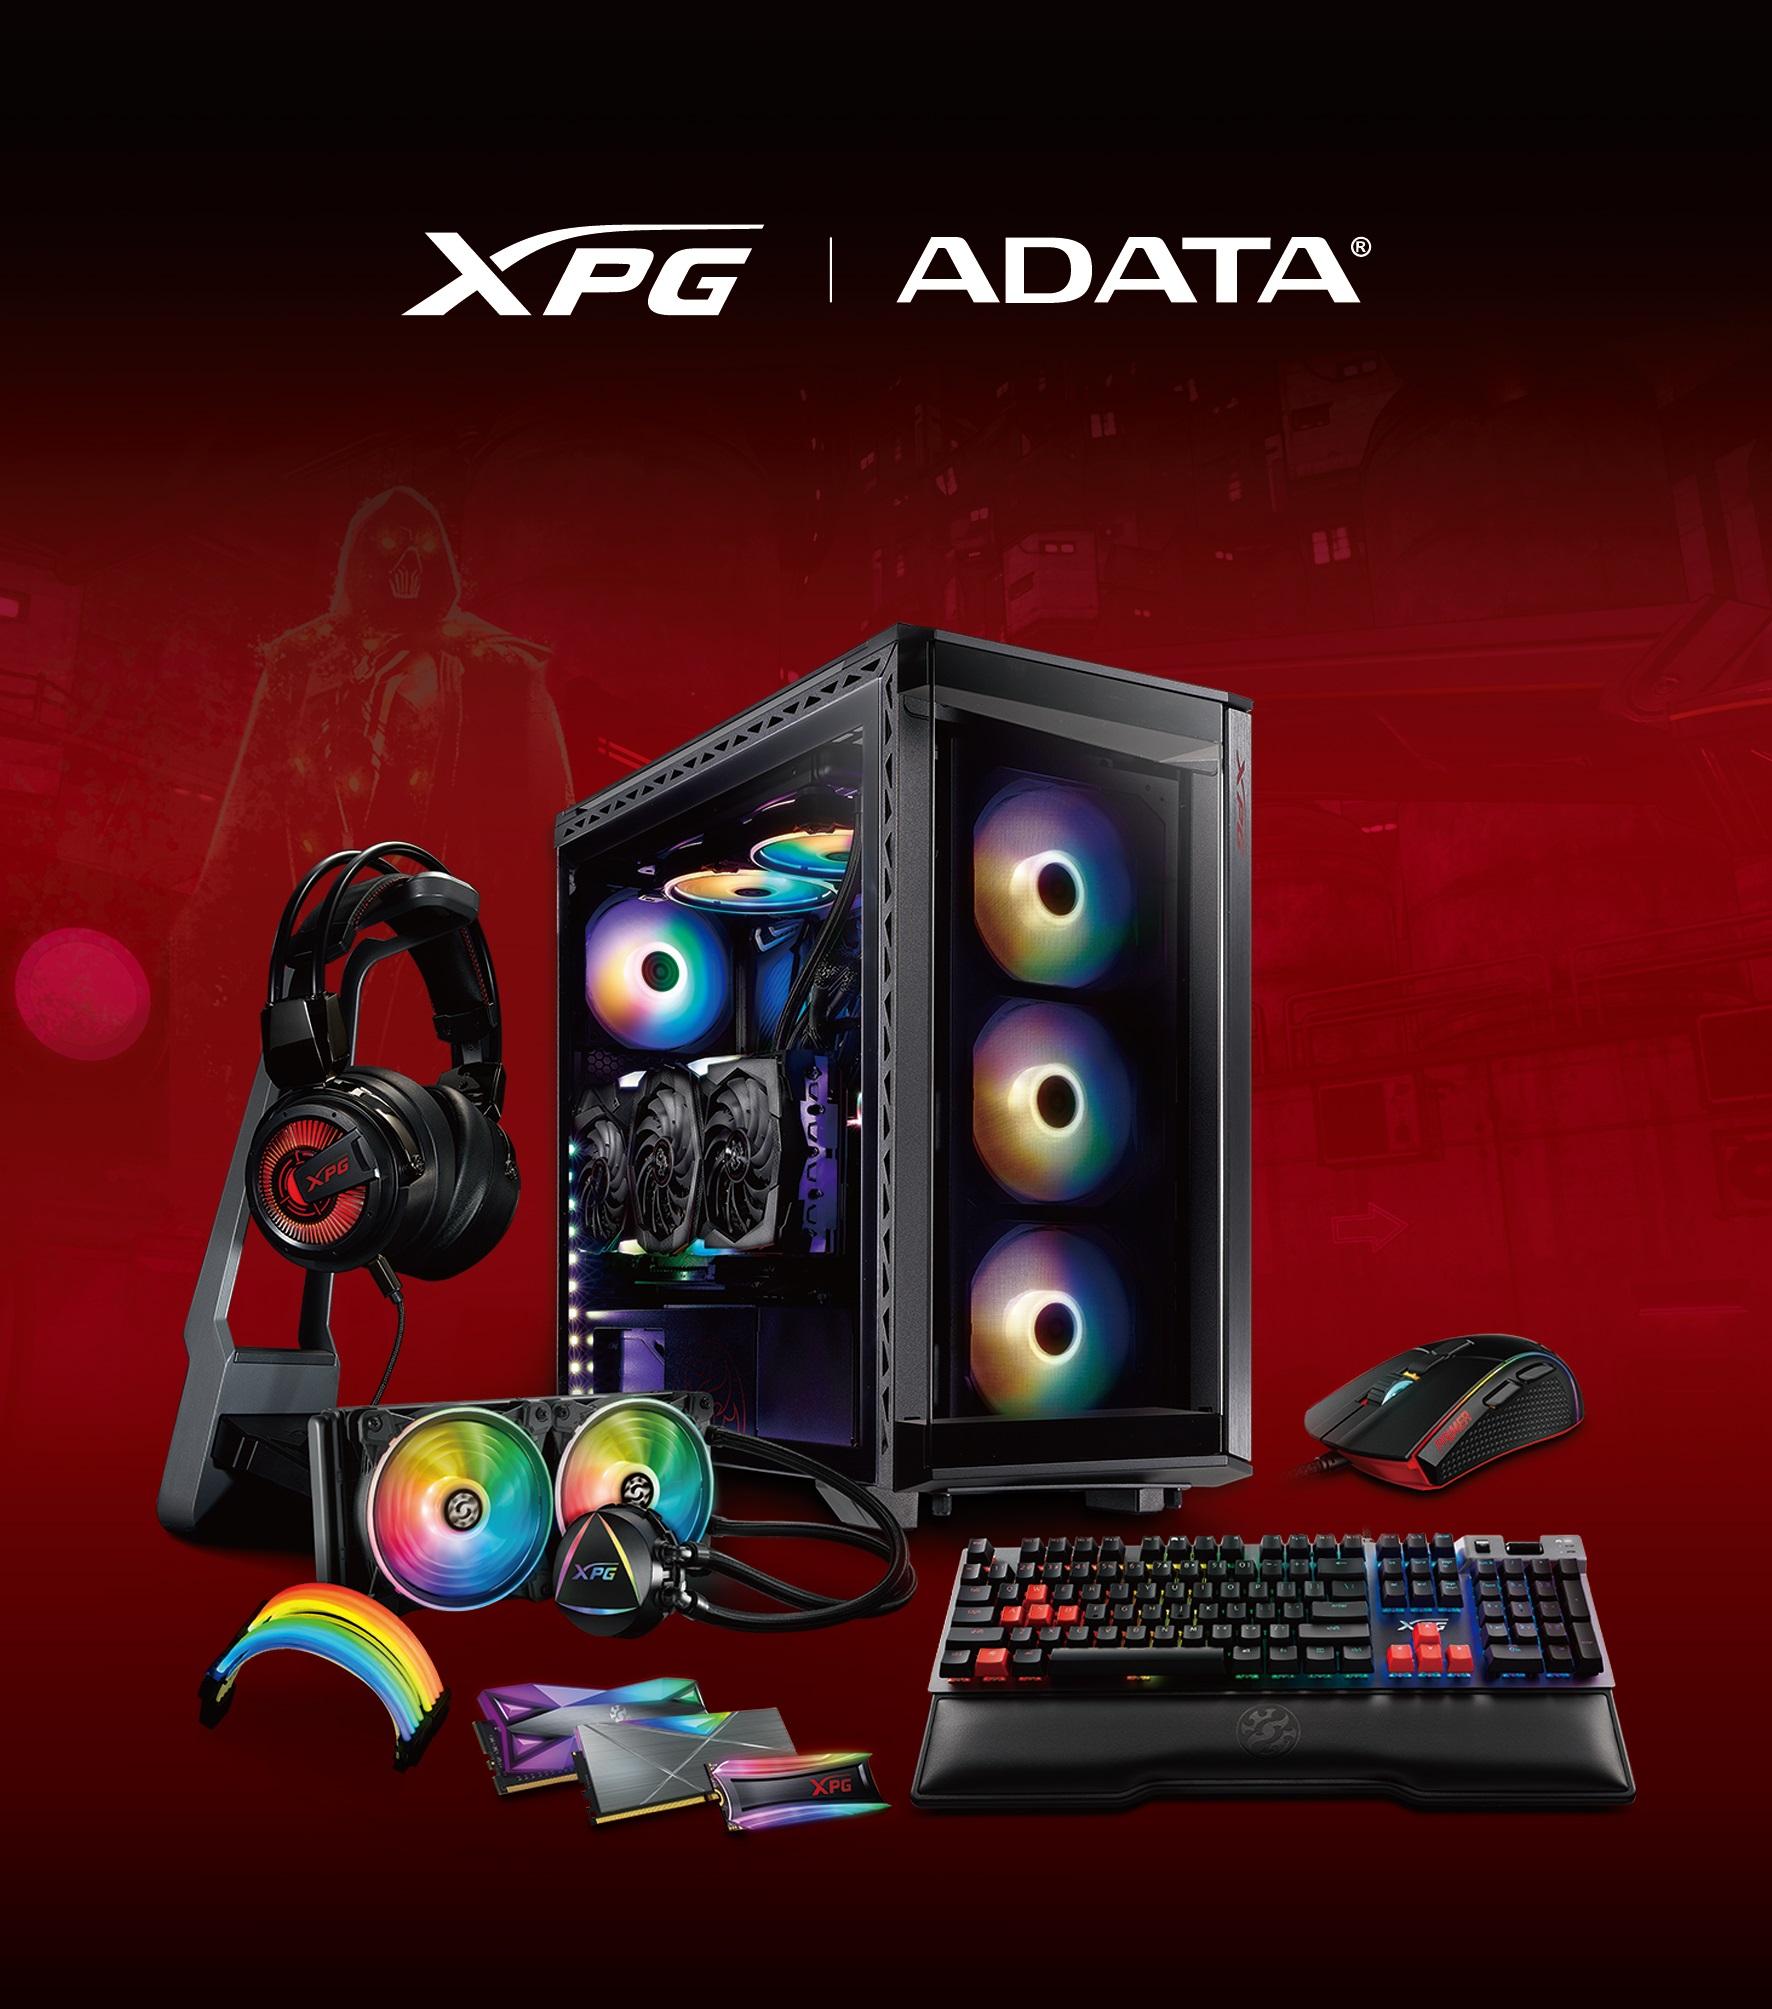 XPG Full series photo HR